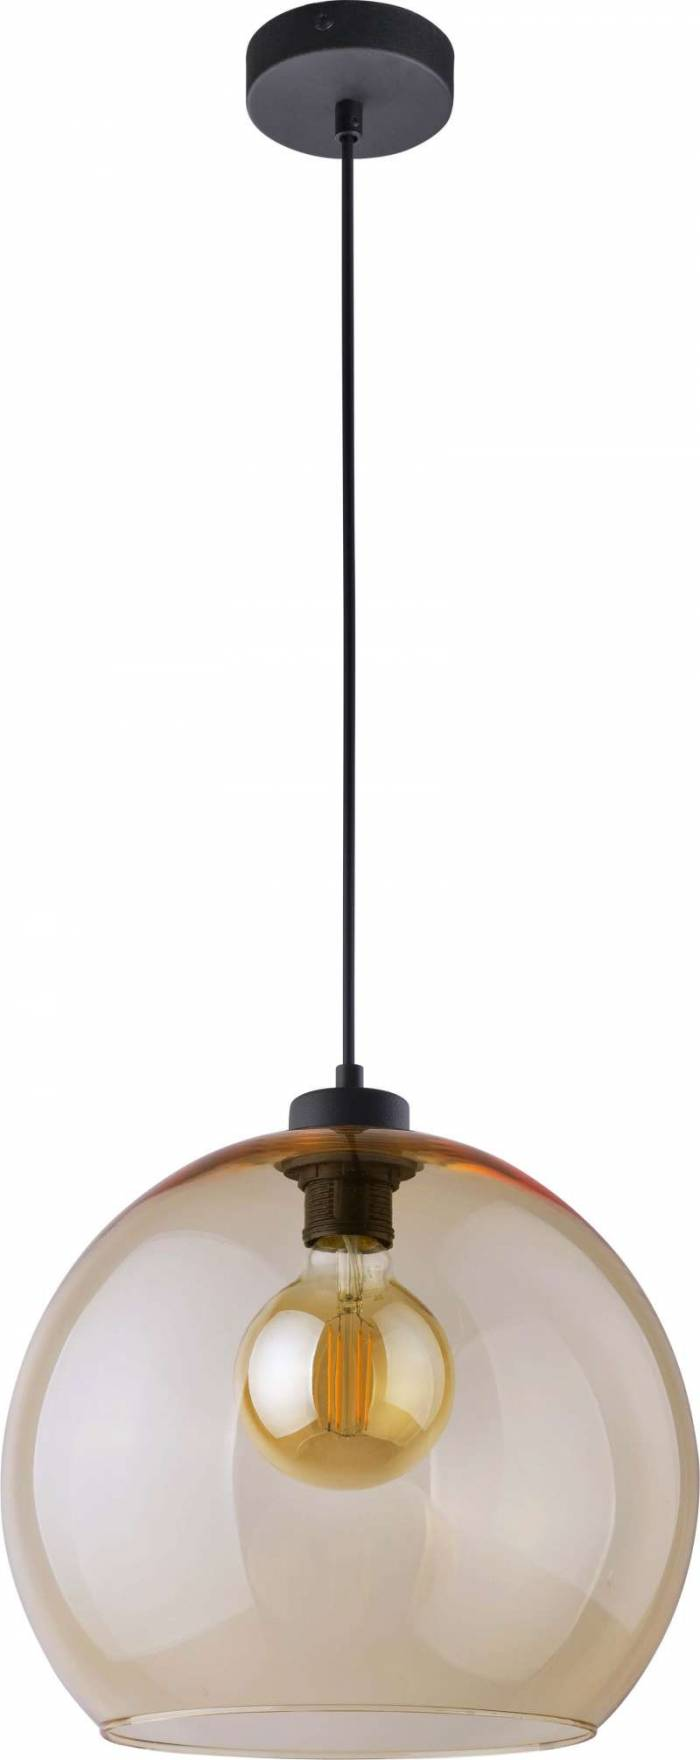 Lustră pendul Sarah , 120x30x30 cm, metal/ sticla/ plastic, chihlimbar/ negru